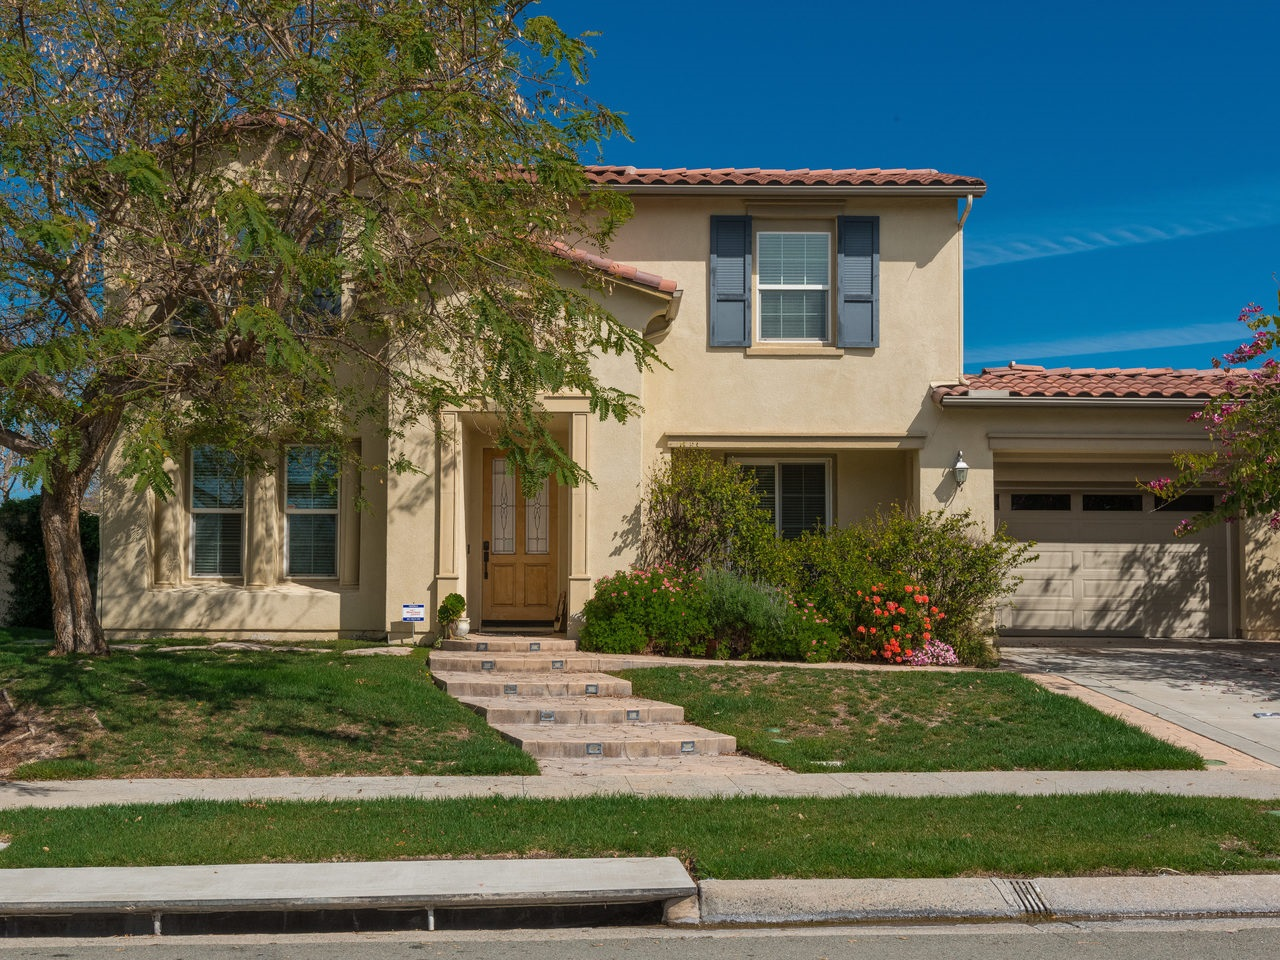 2715 Joshua Creek Rd, Chula Vista, CA